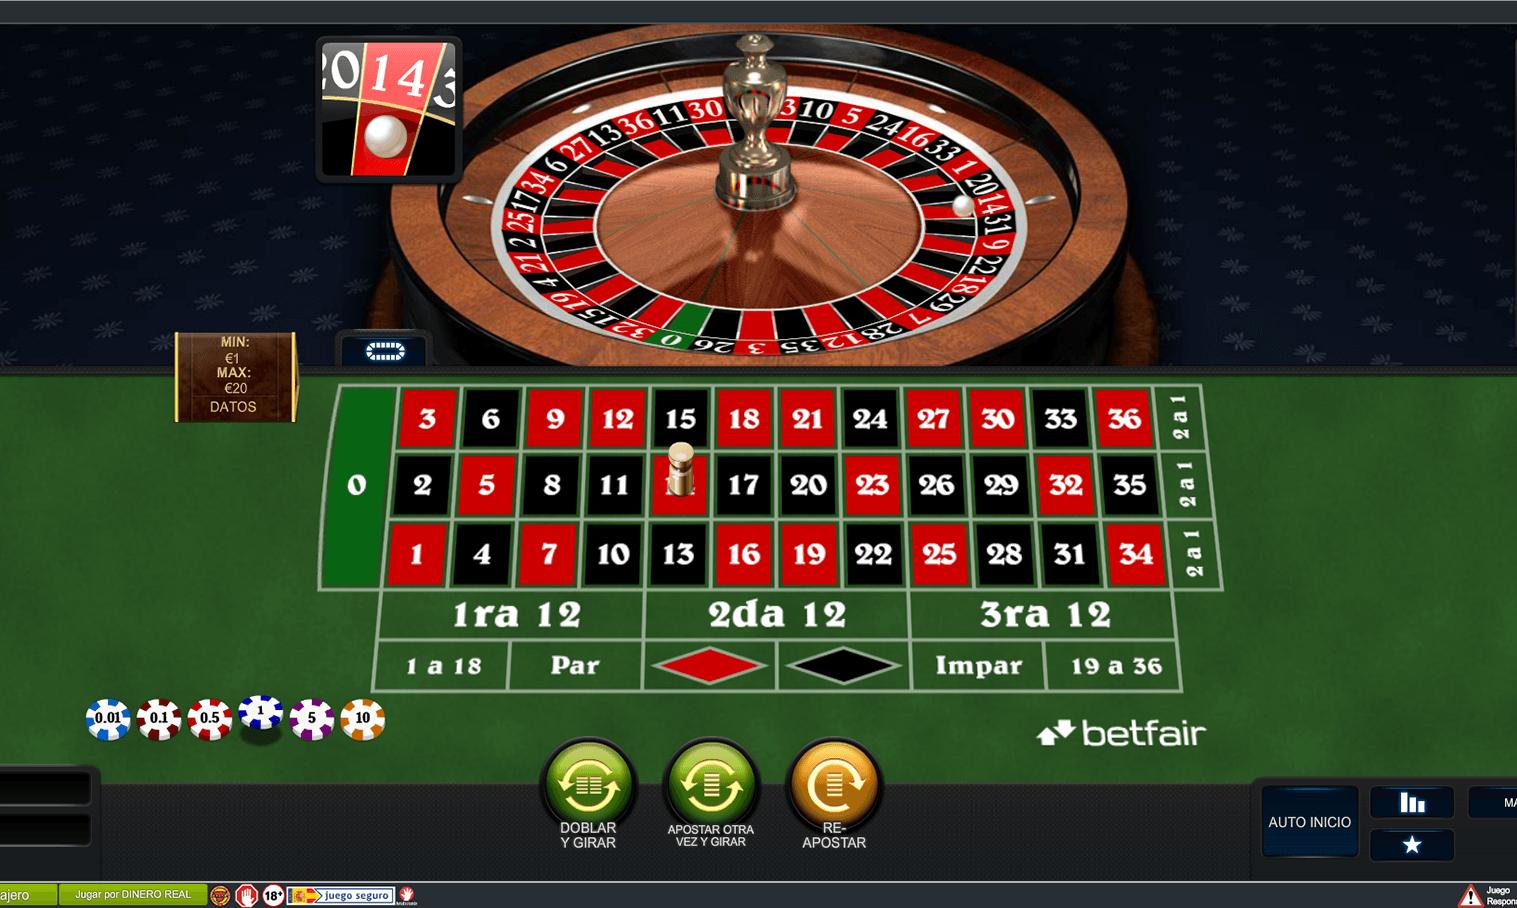 Juegos SilverOakcasino com ruleta gratis con premios-217206